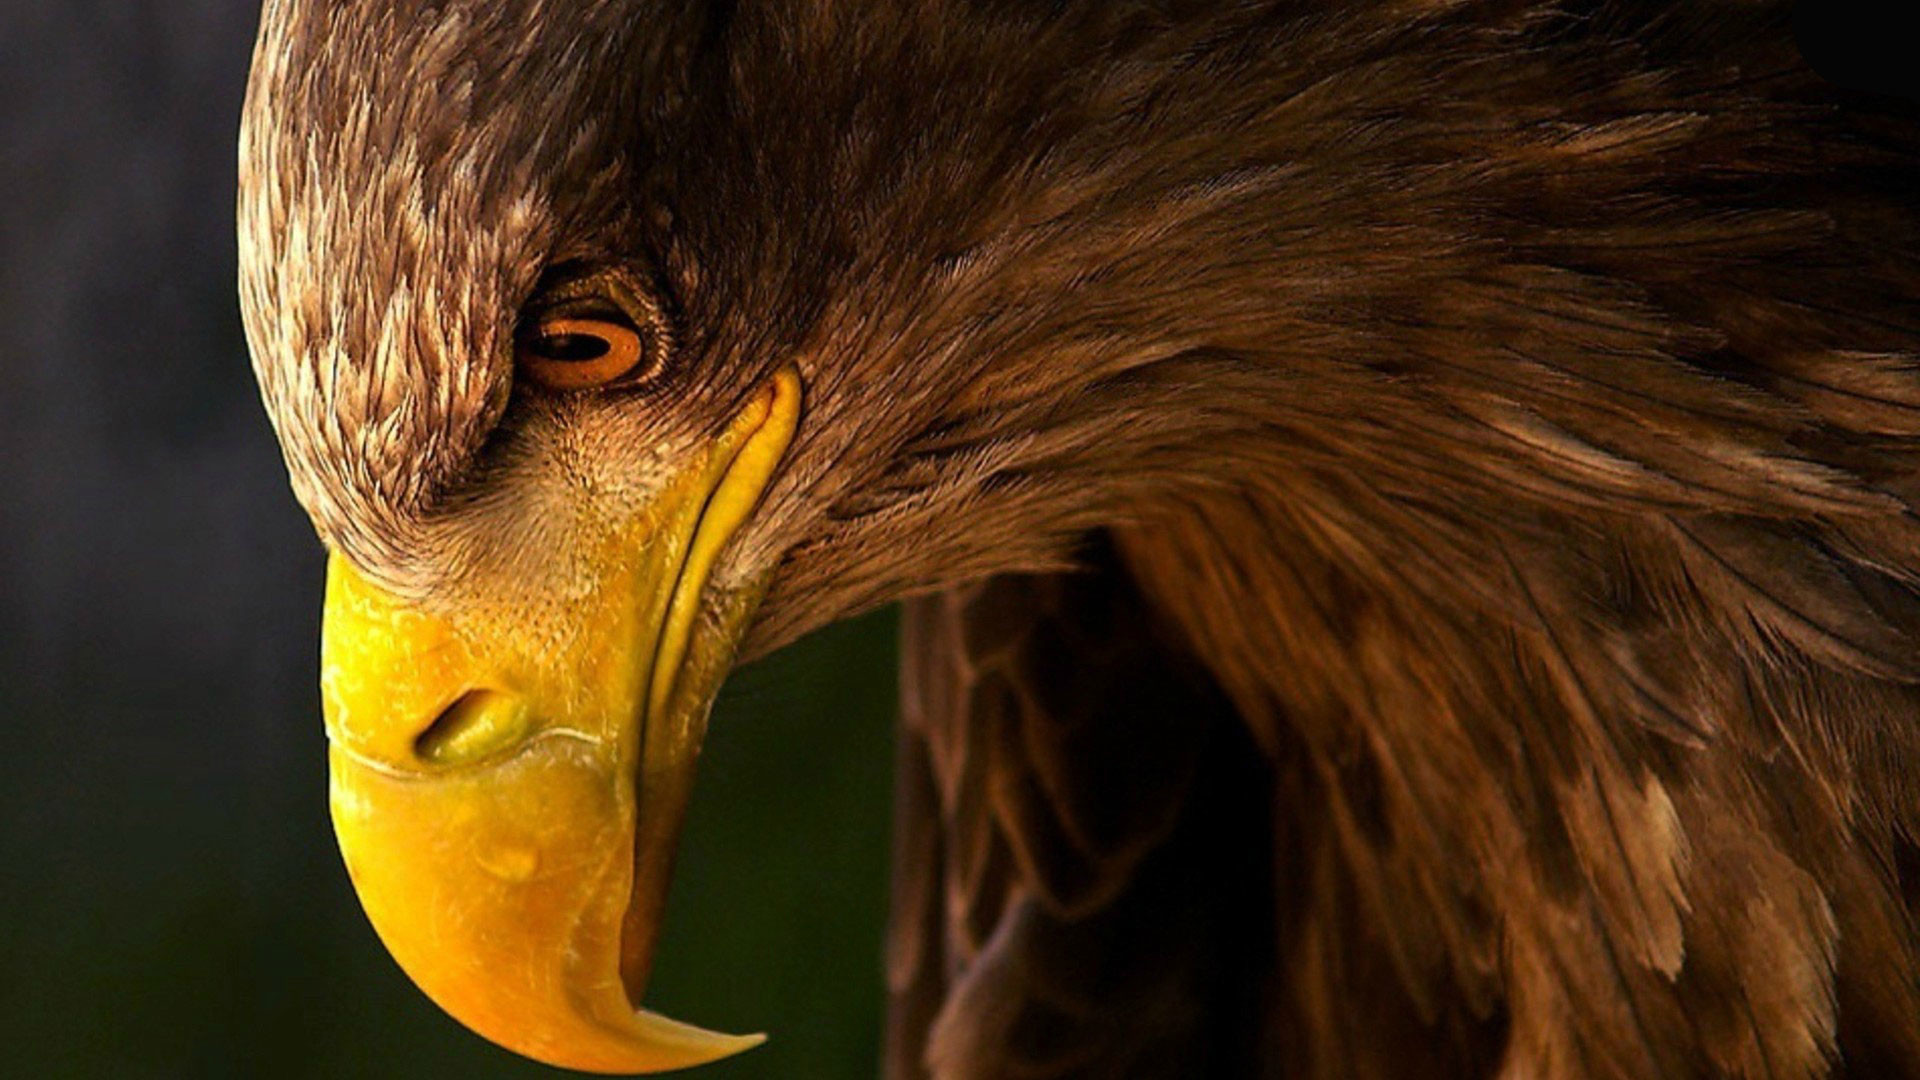 Eagle desktop wallpaper 73 images - Animal and bird hd wallpaper ...